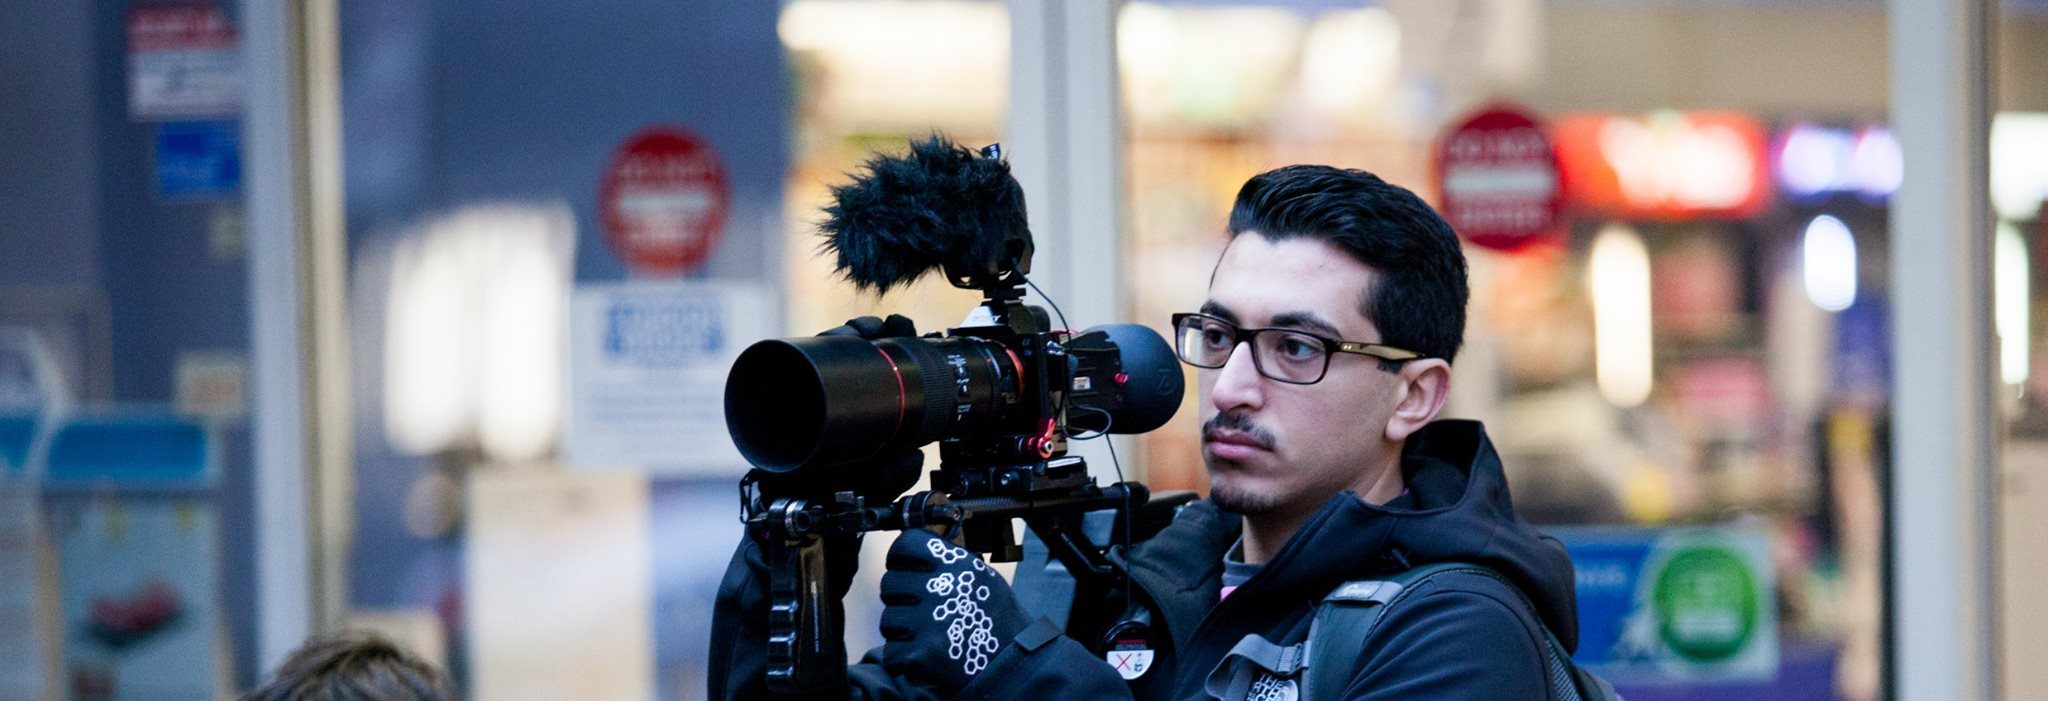 vancouver_video_production_Pixel_Motion_Films_motorizedgimbal_movi_2